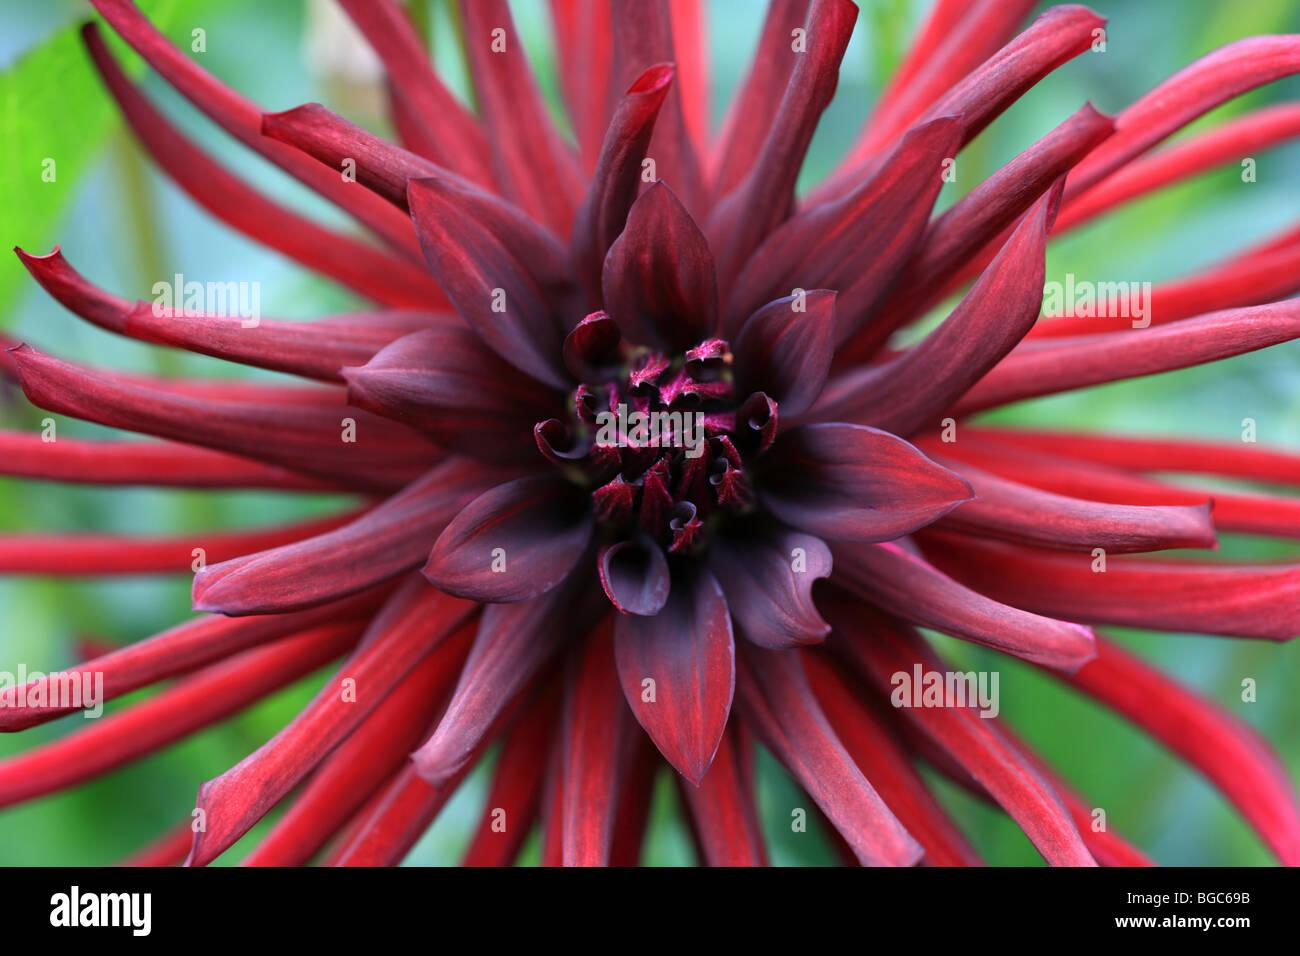 Dalia Cactus Orfeo rojo escarlata flor de verano Imagen De Stock